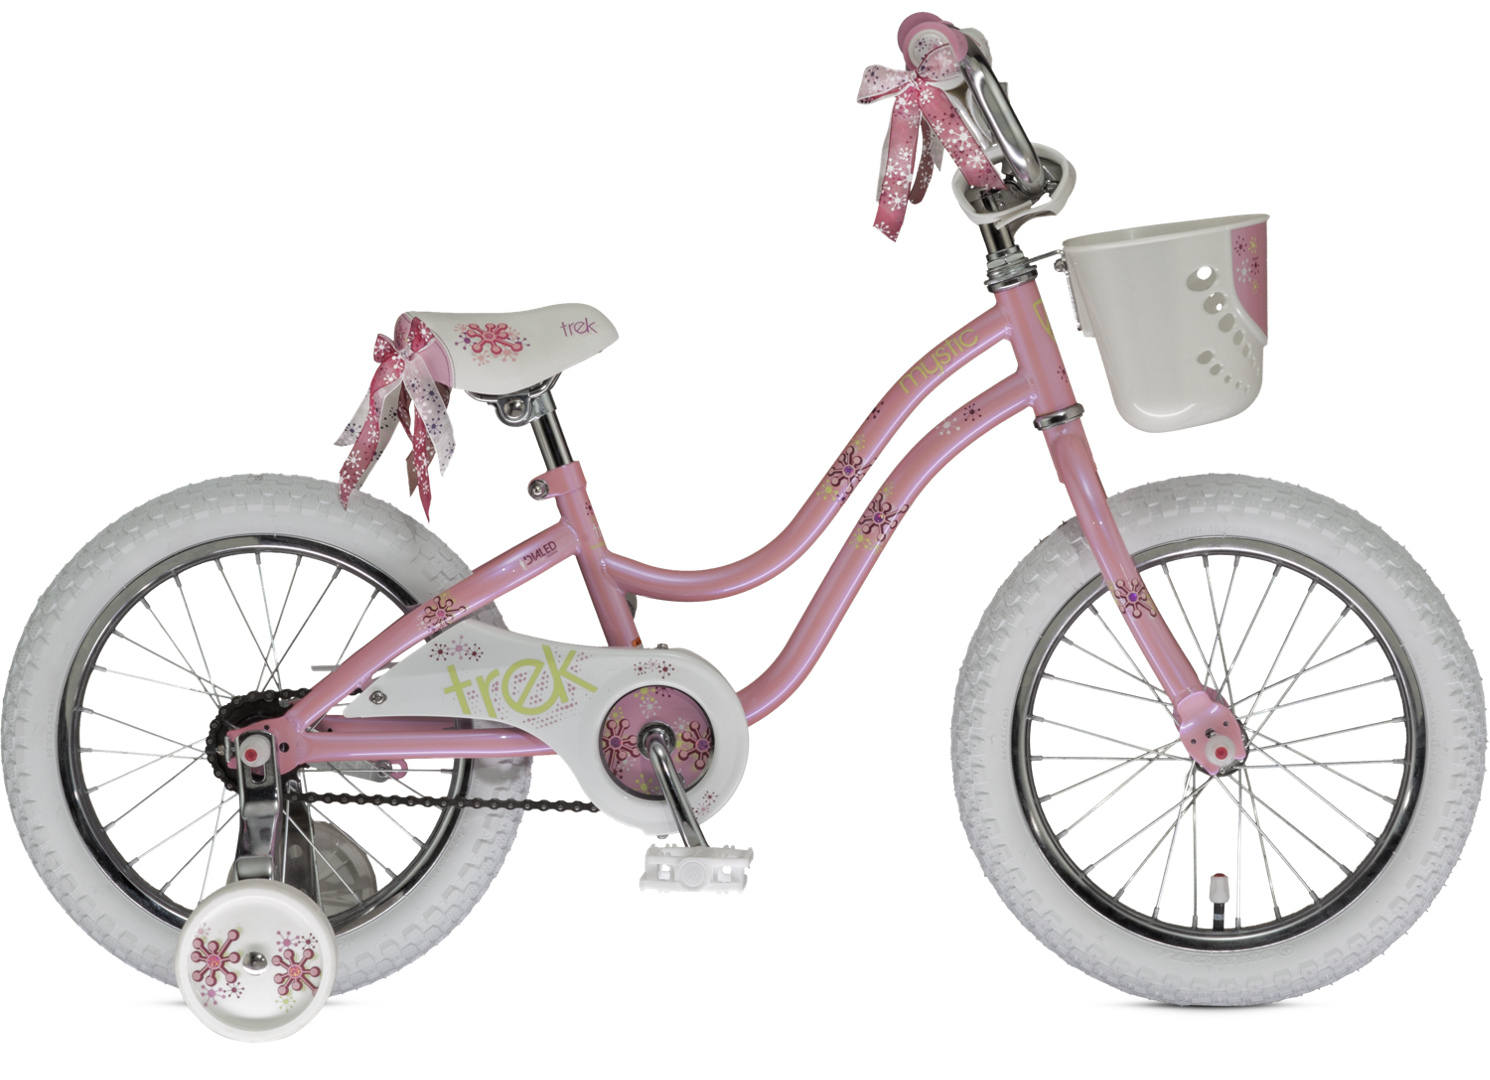 5c1860a45a1 2013 Mystic 16 - Bike Archive - Trek Bicycle